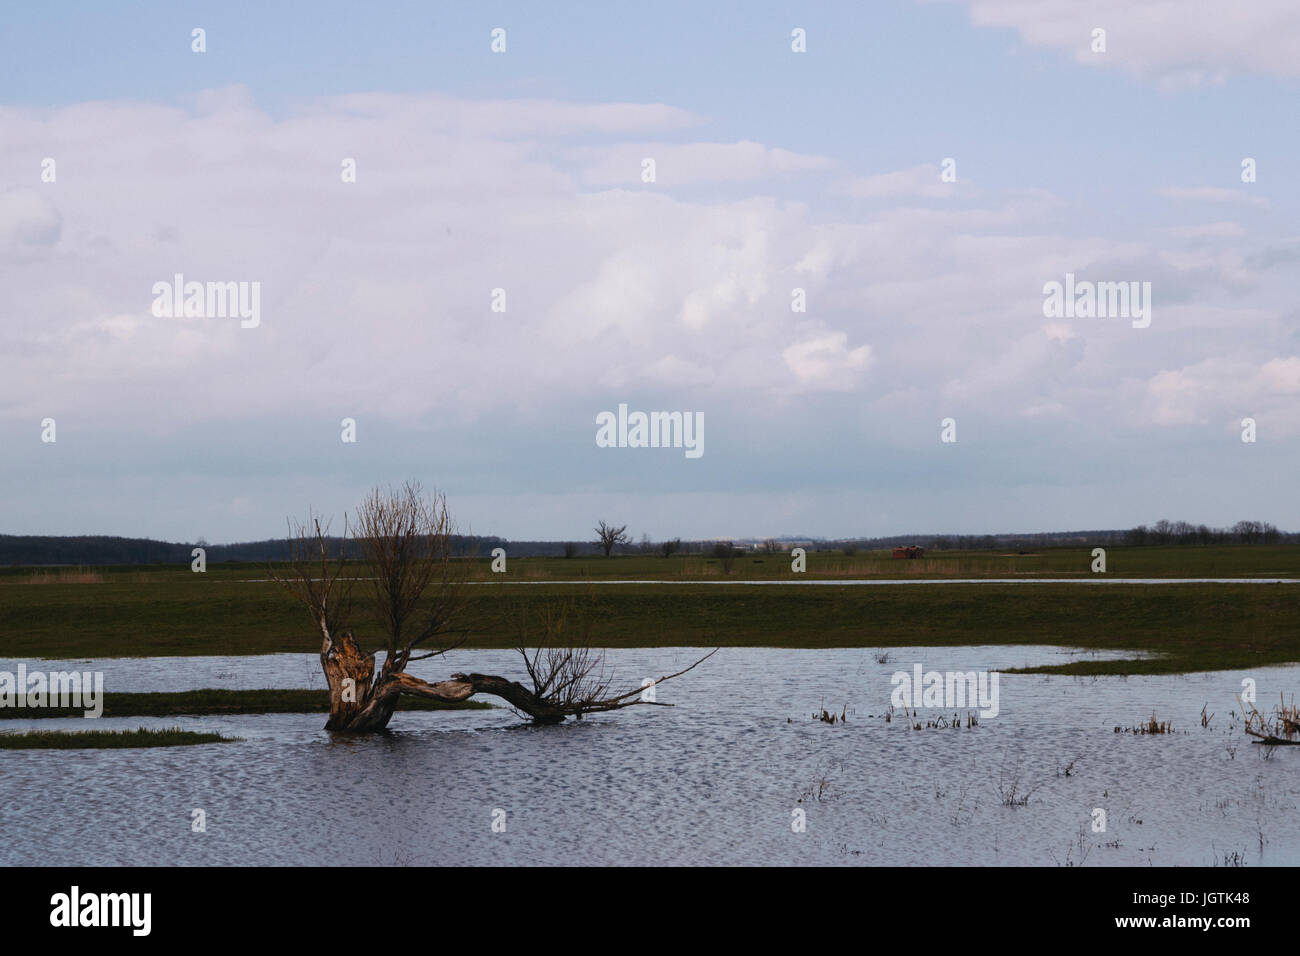 Pasture inland water - Stock Image